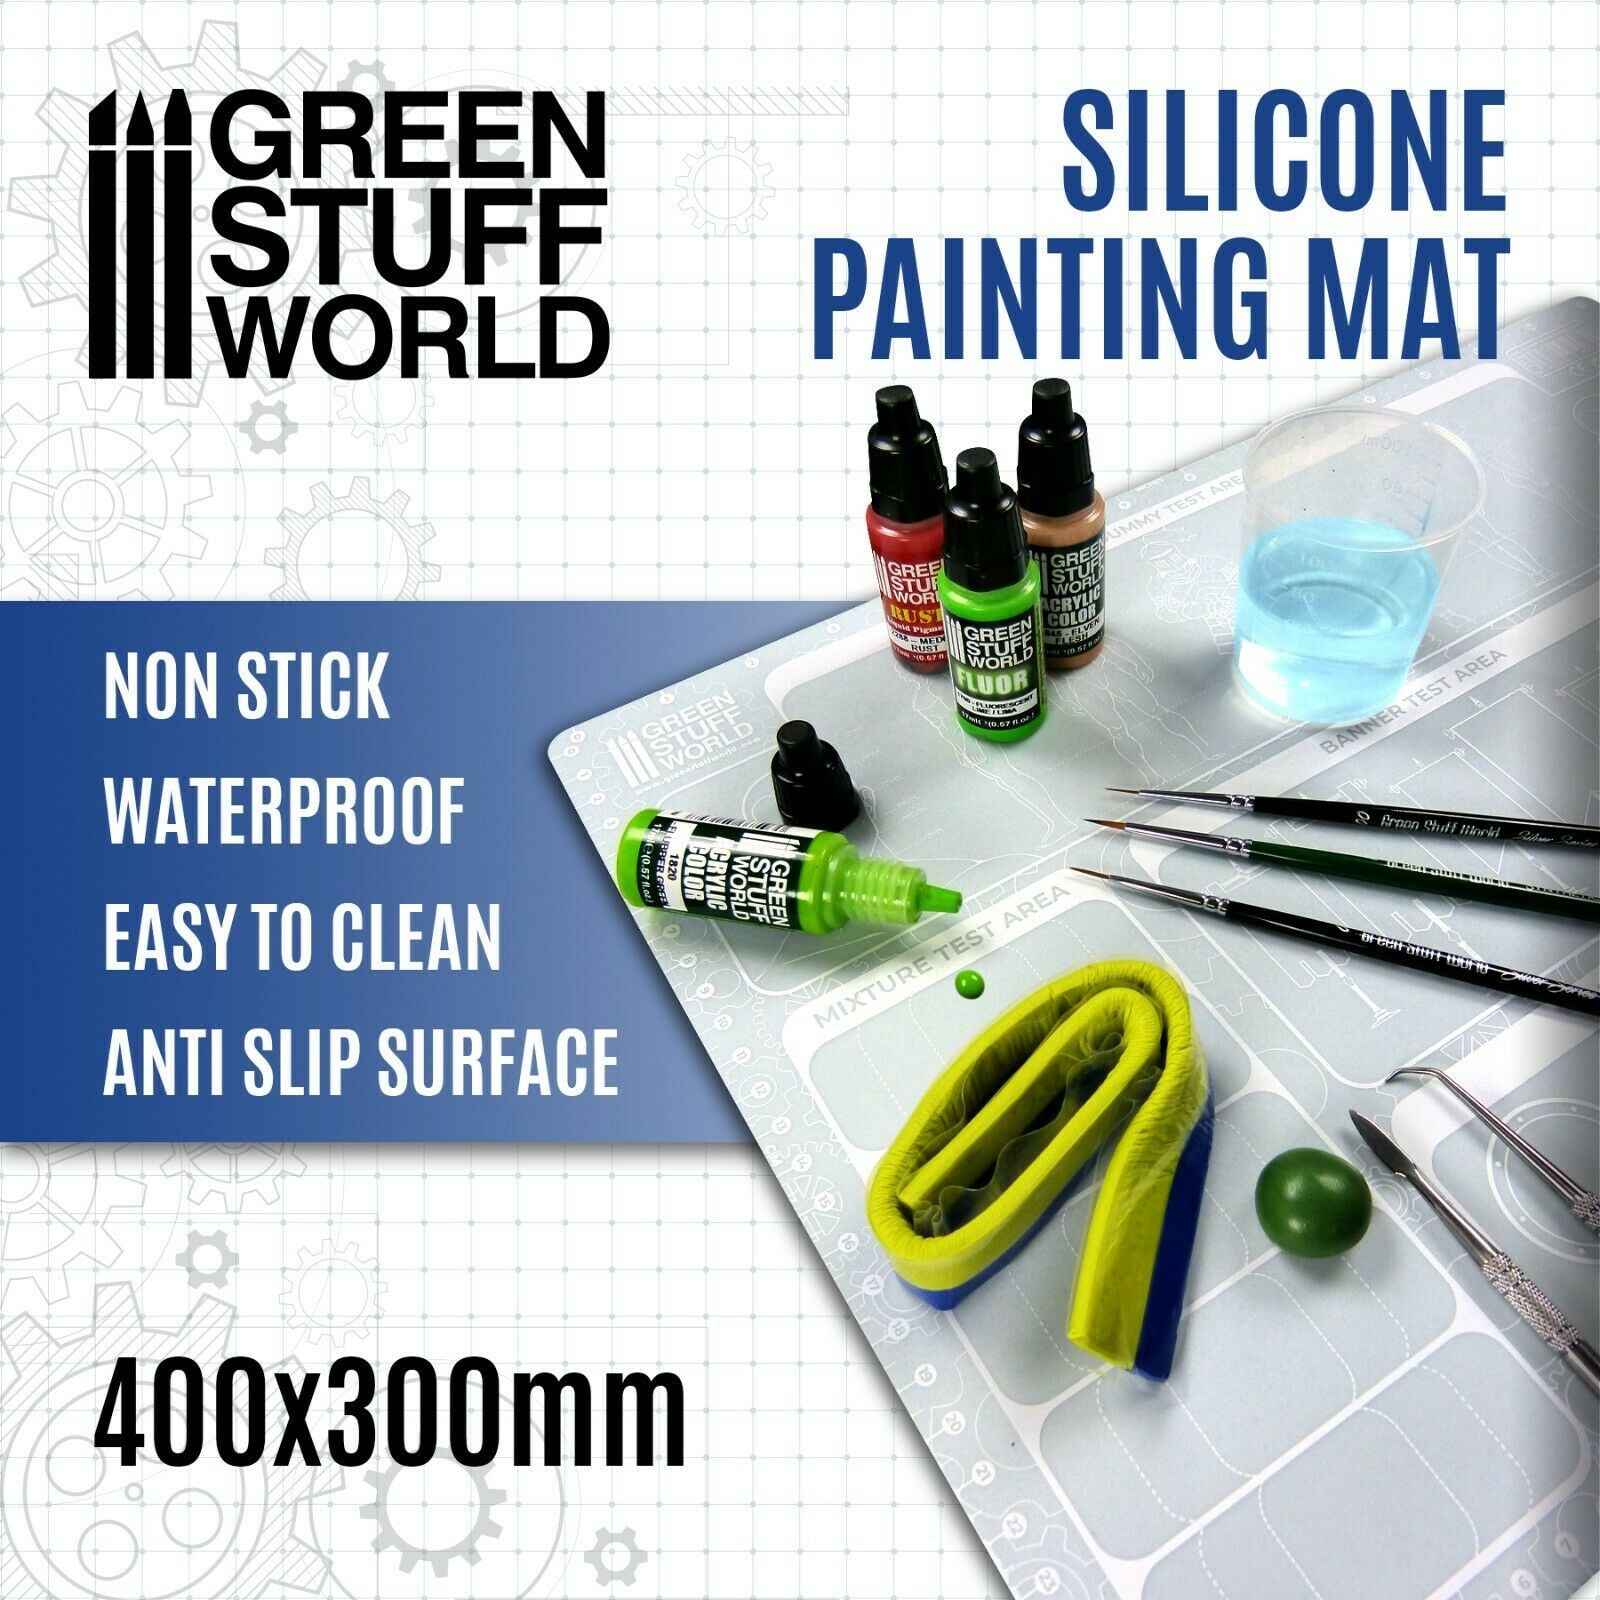 Tapete de Pintura 400x300mm - pintar miniatura warhammer 40K pintor escultor